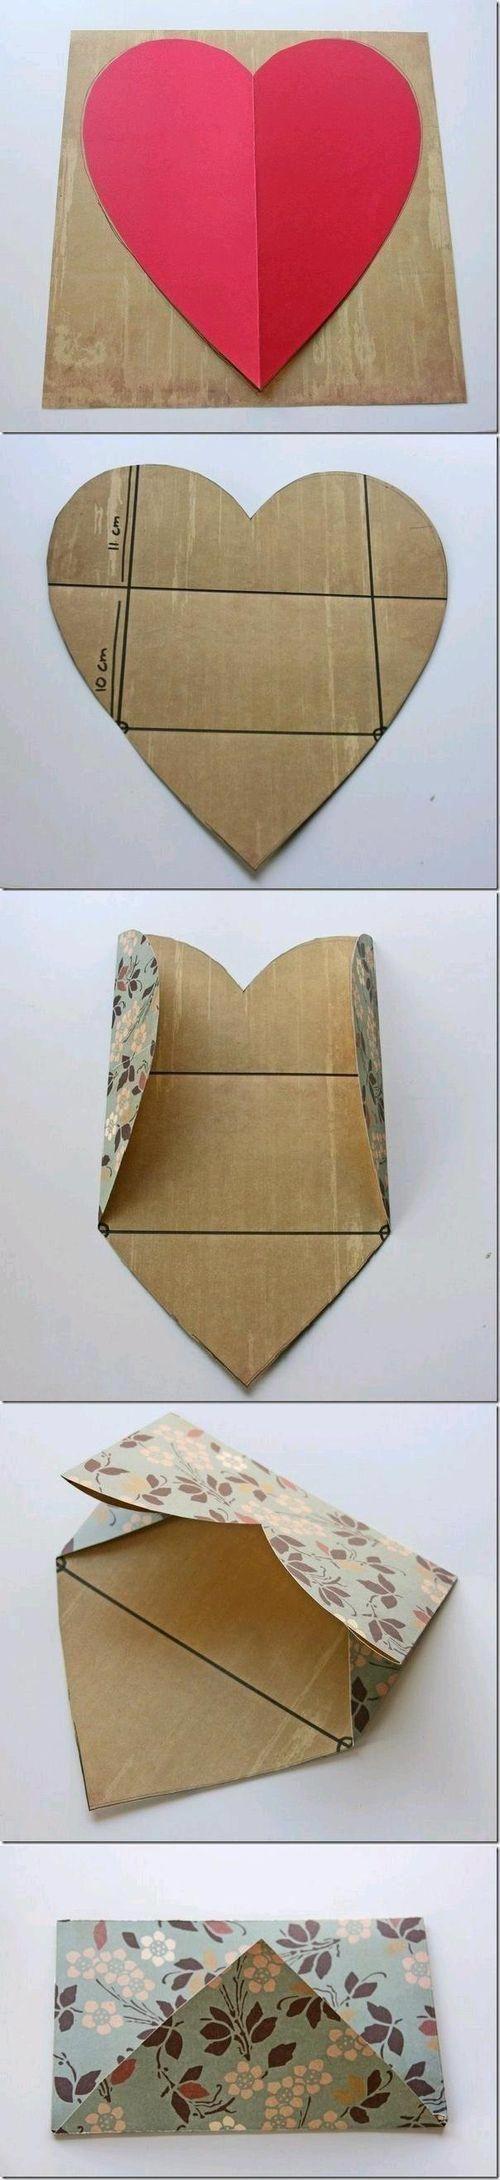 How to make heart envelopes